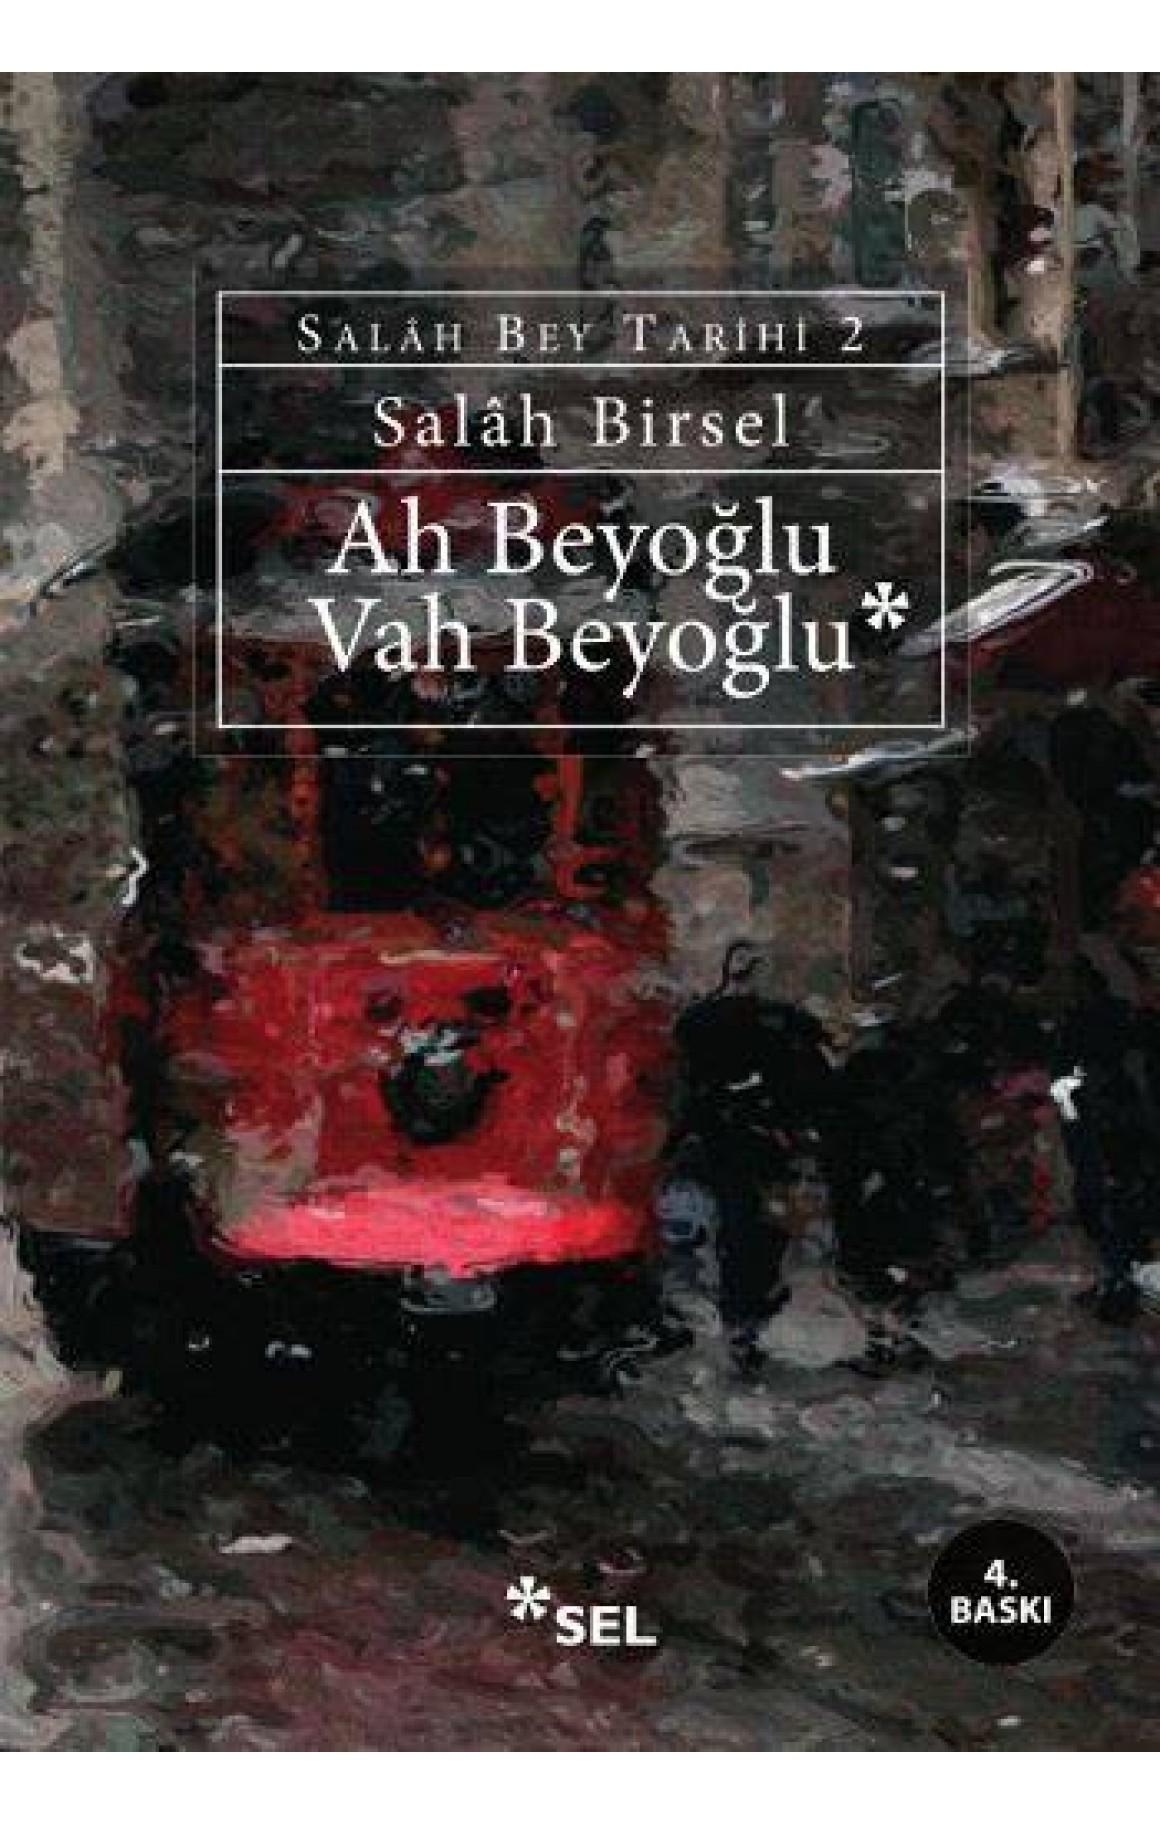 Ah Beyoğlu Vah Beyoğlu -Salah Bey Tarihi:II